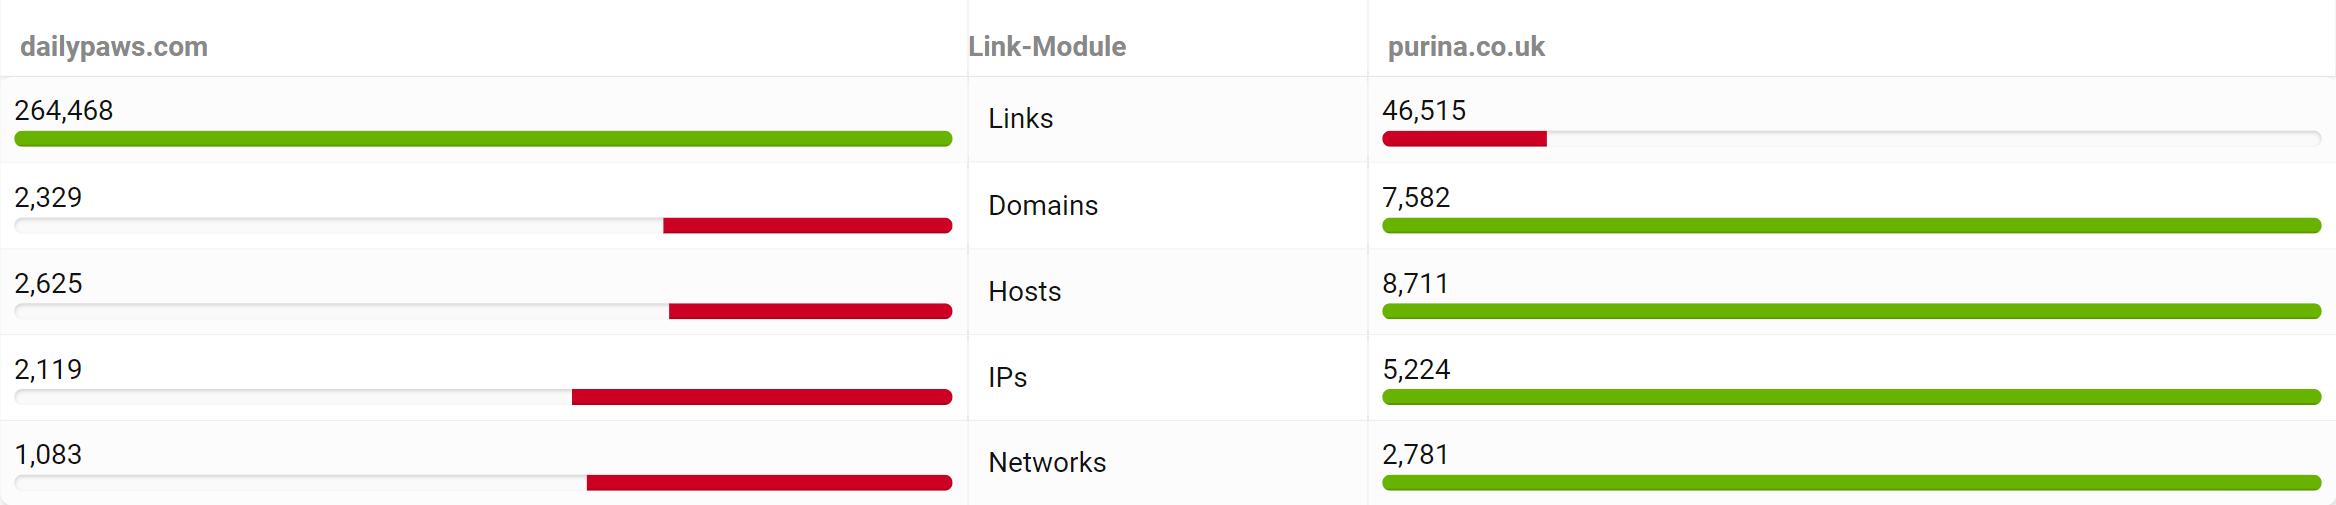 purina.co.uk and dailypaws.com link statistics.